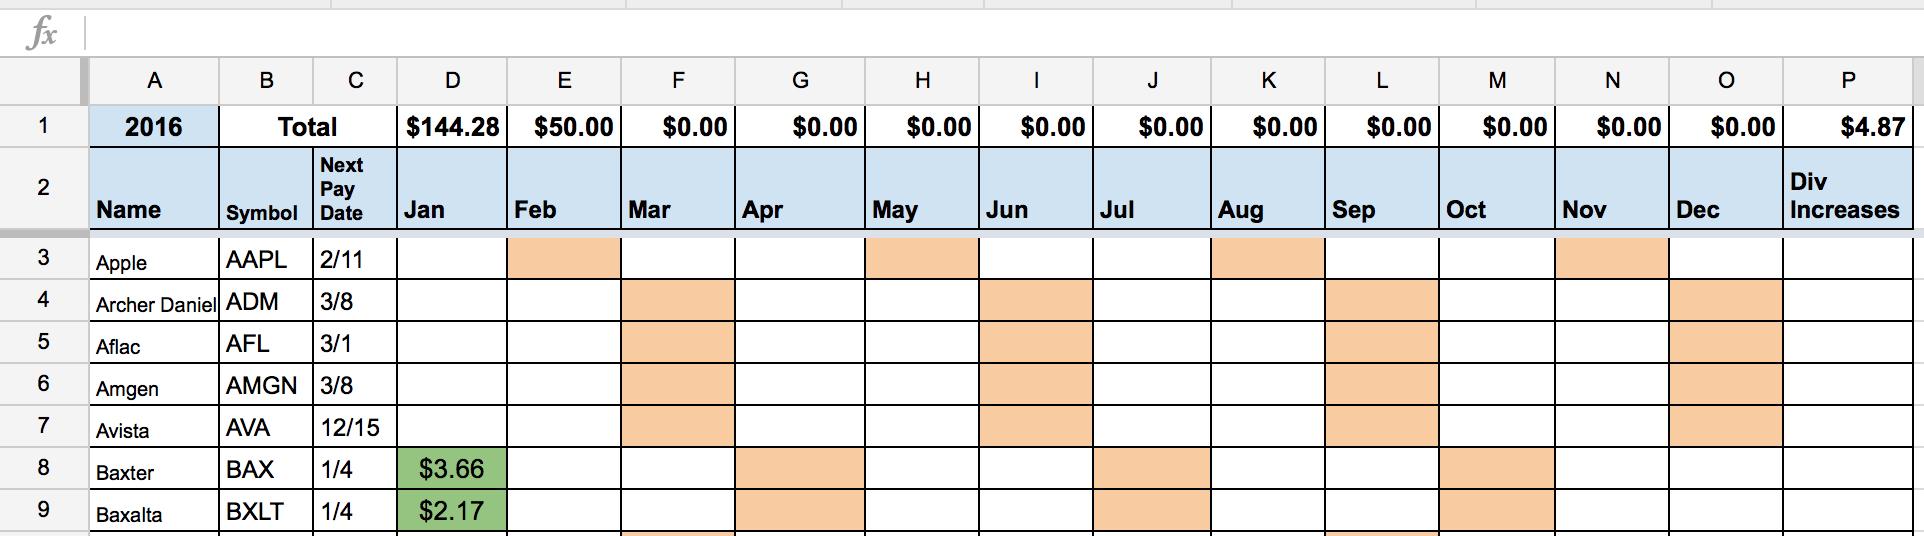 Dividend Spreadsheet Templates Pertaining To Dividend Stock Portfolio Spreadsheet On Google Sheets – Two Investing Dividend Spreadsheet Templates Printable Spreadshee Printable Spreadshee dividend spreadsheet templates